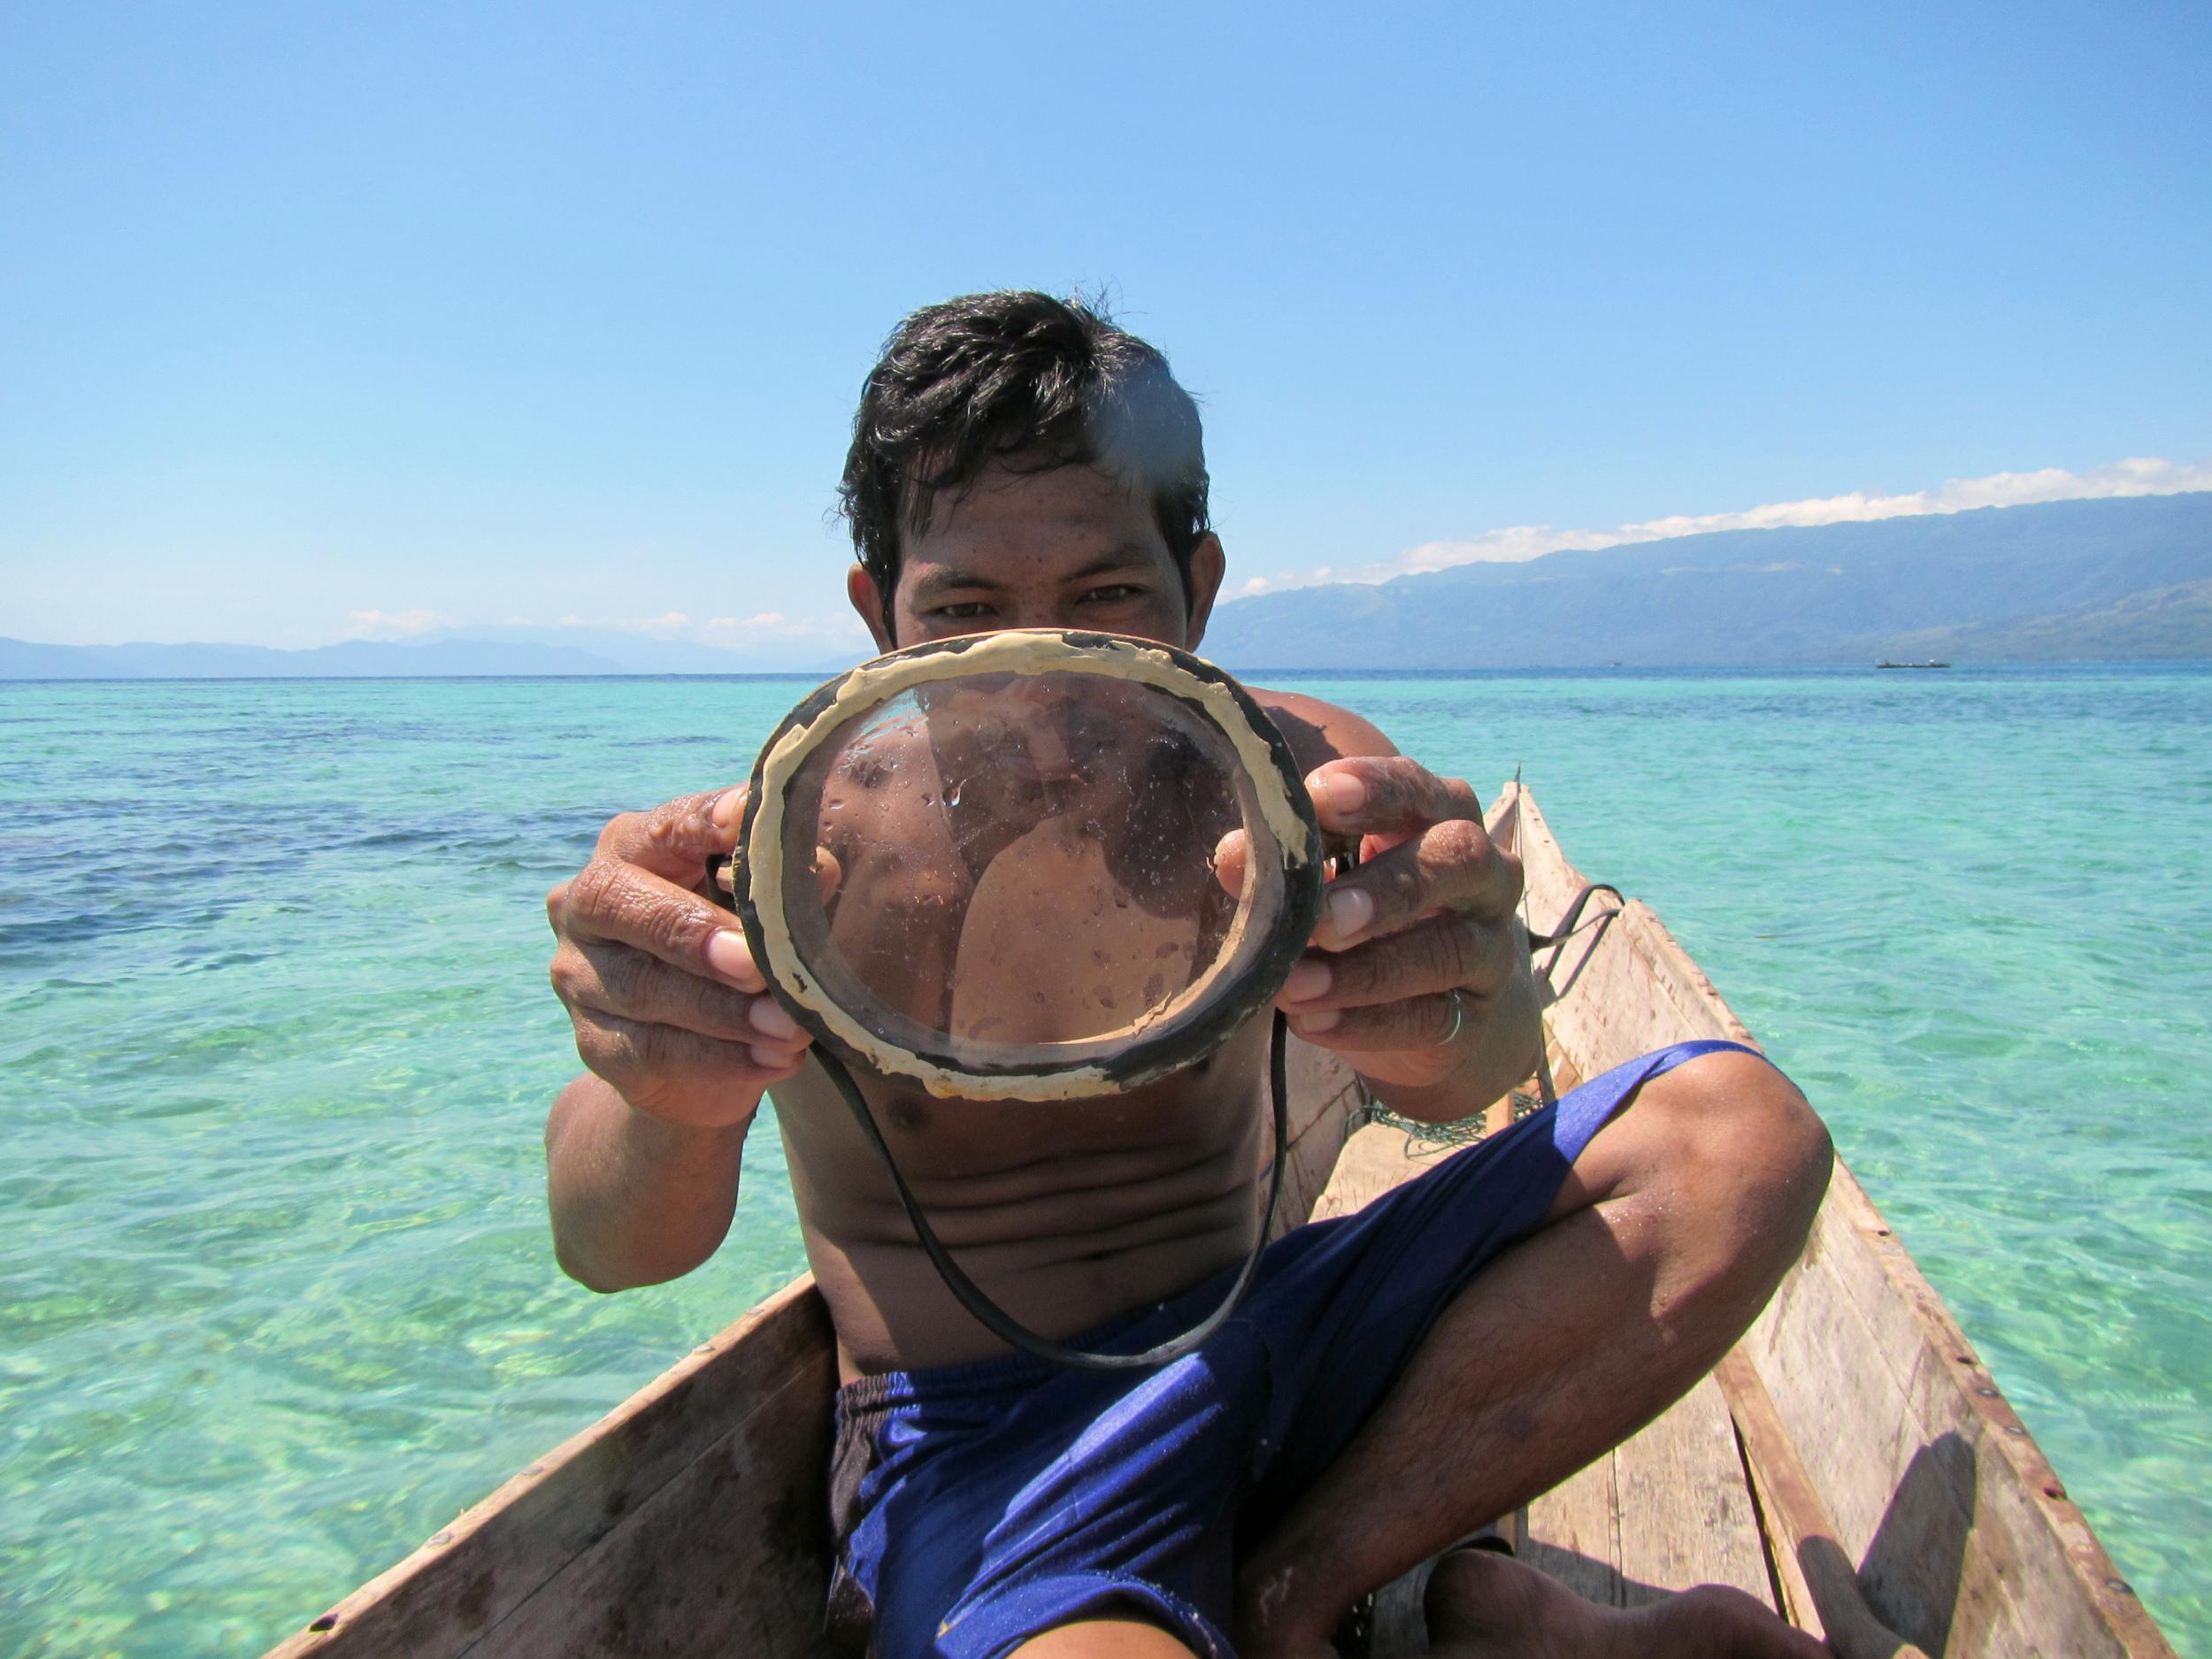 A Bajau diver displays a traditional wooden diving mask